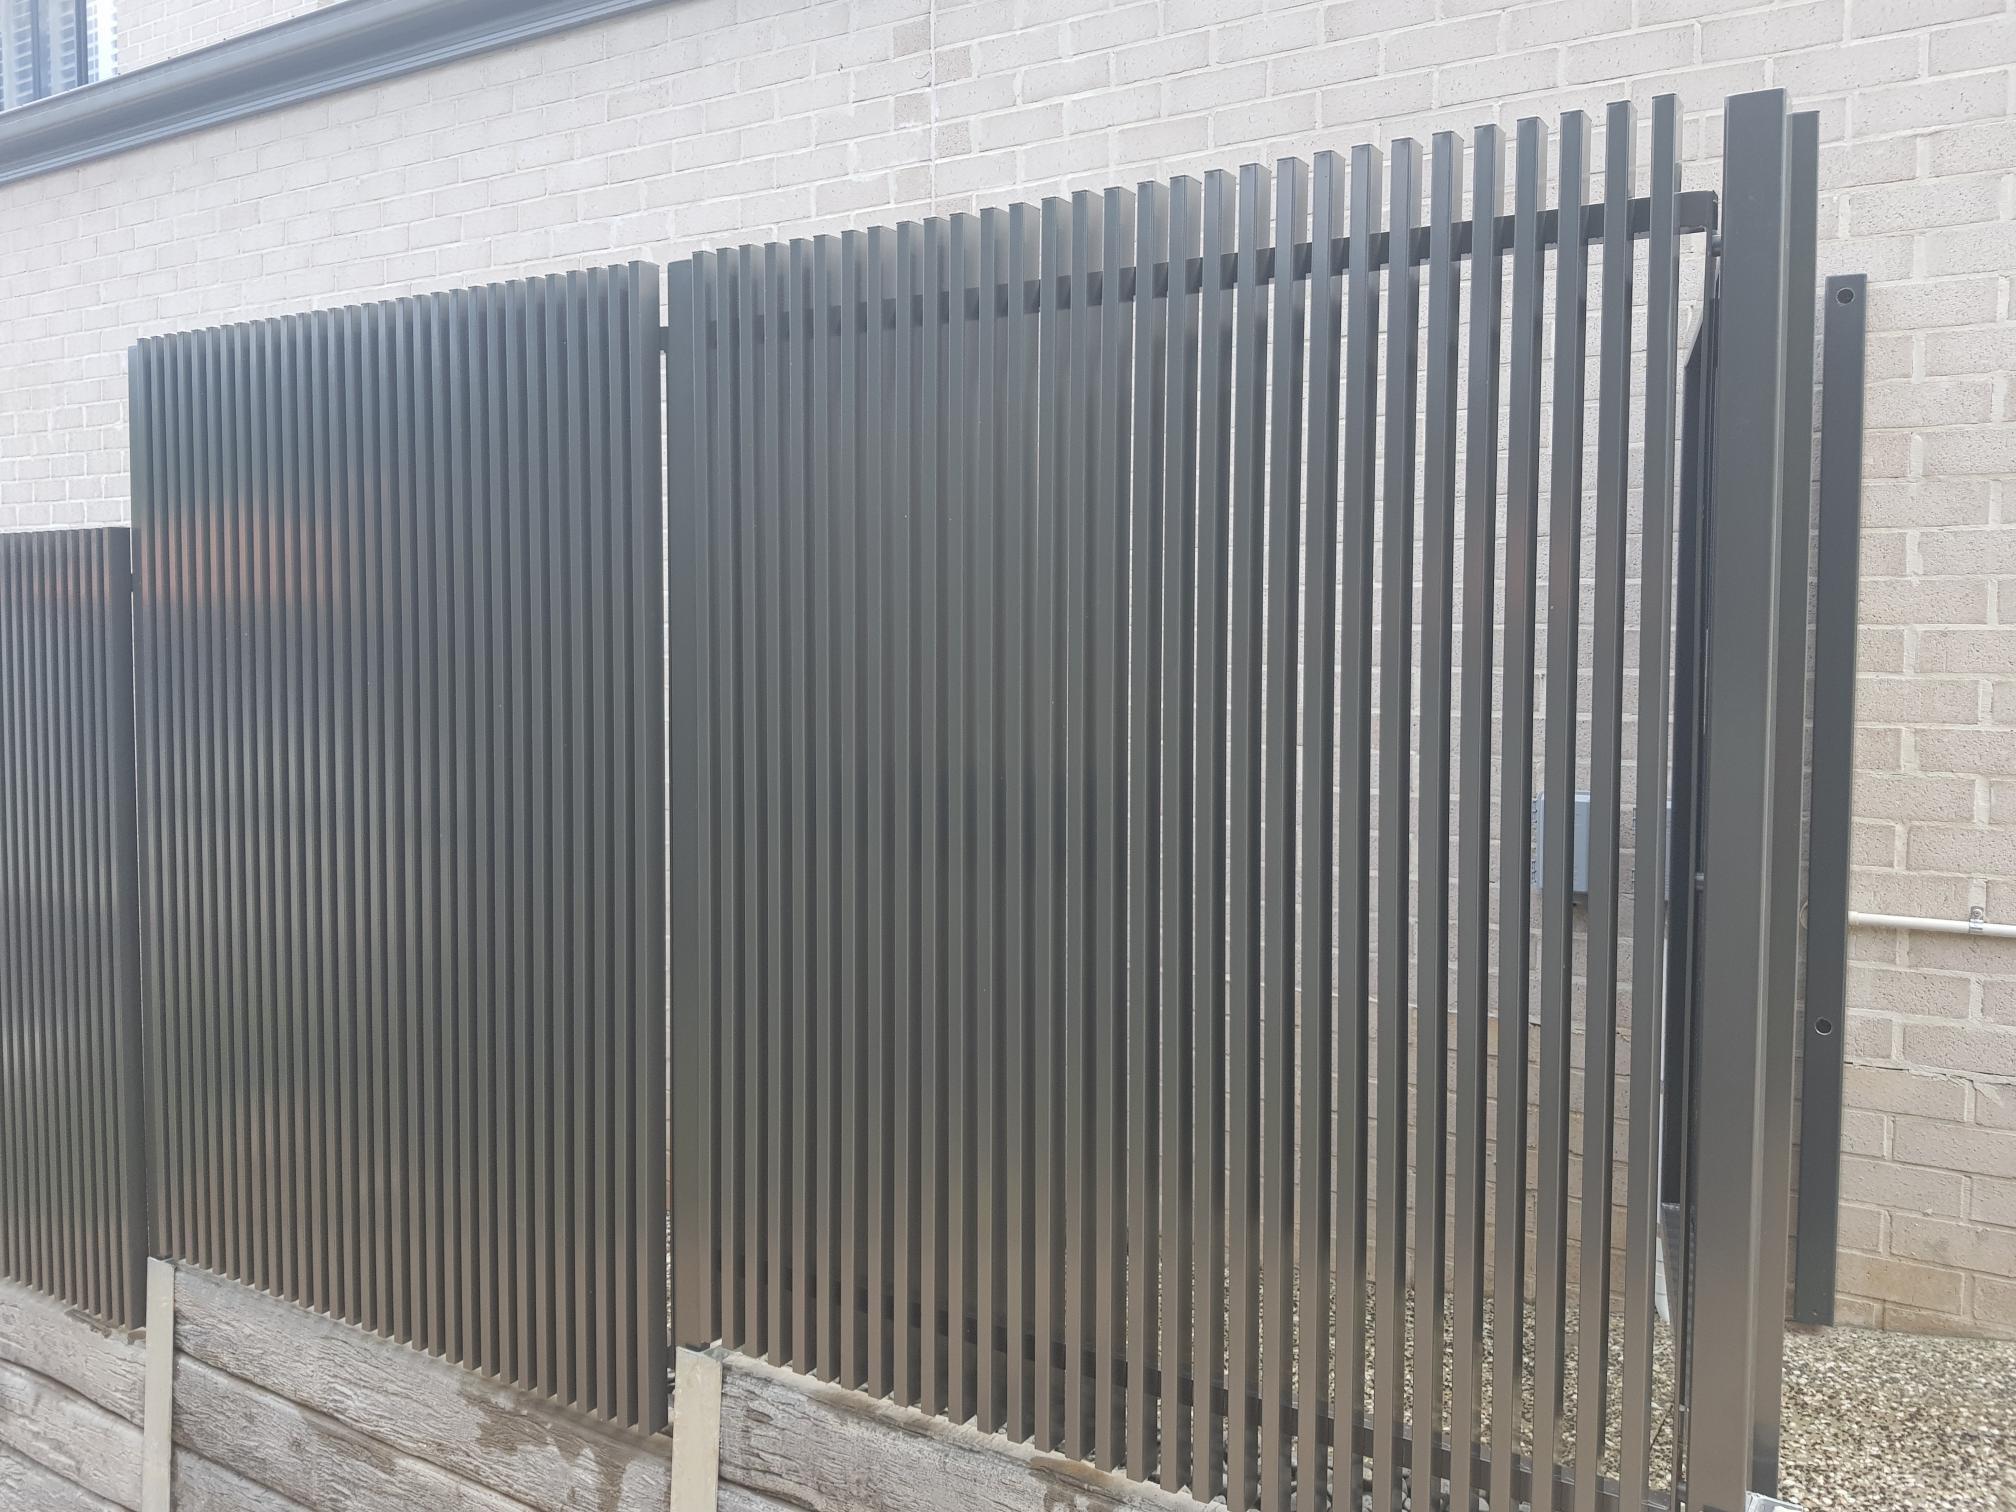 Aluminium Fencing 8 - www.thefabcompany.com.au